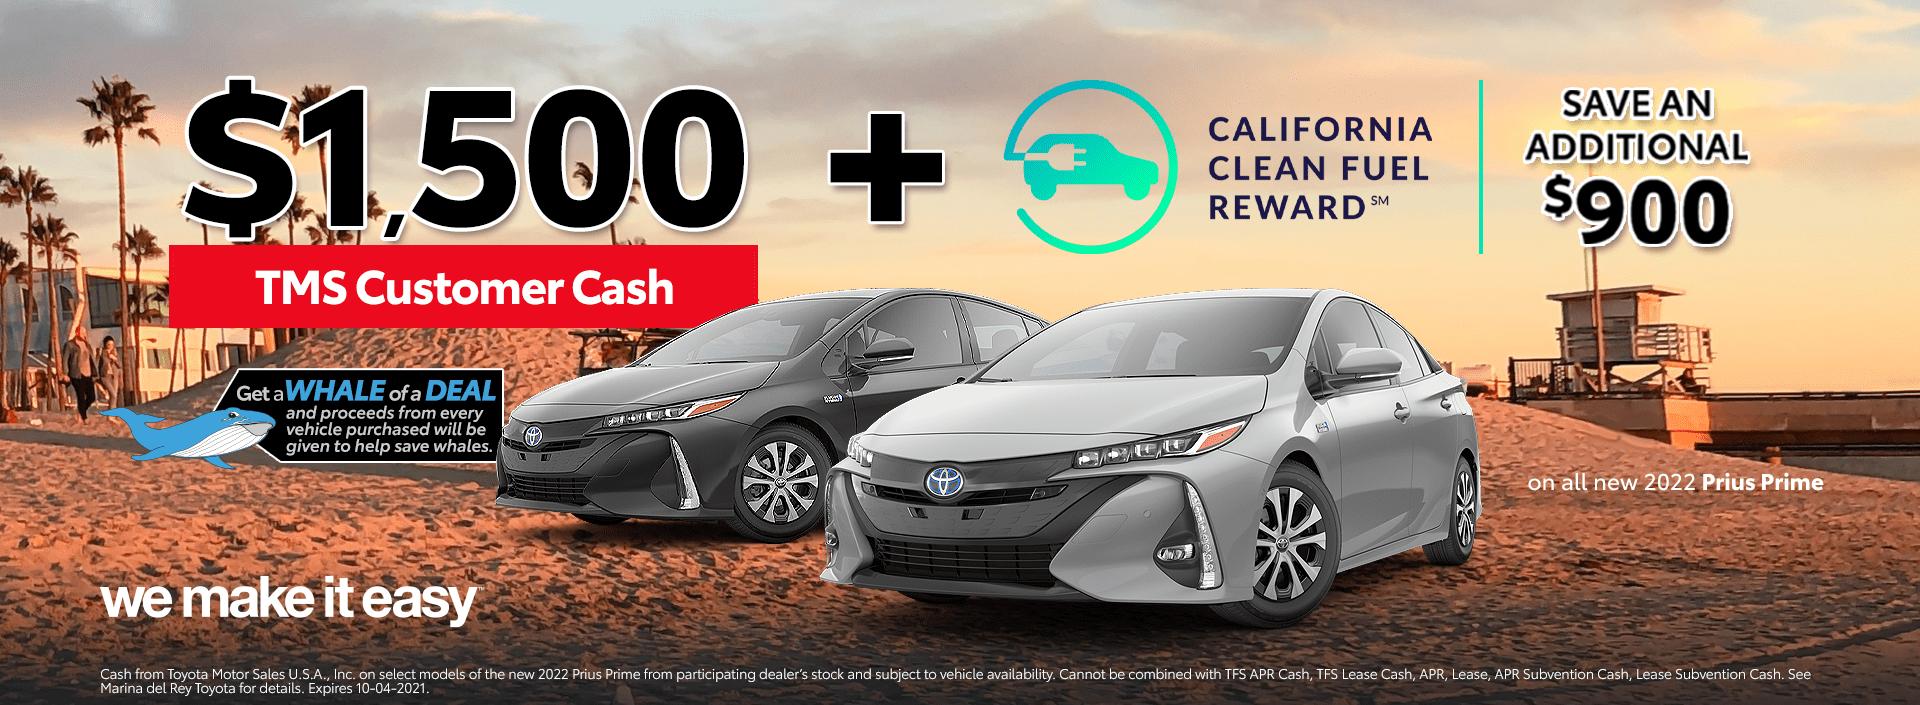 Toyota Prius Prime Deals Specials Incentives Offers